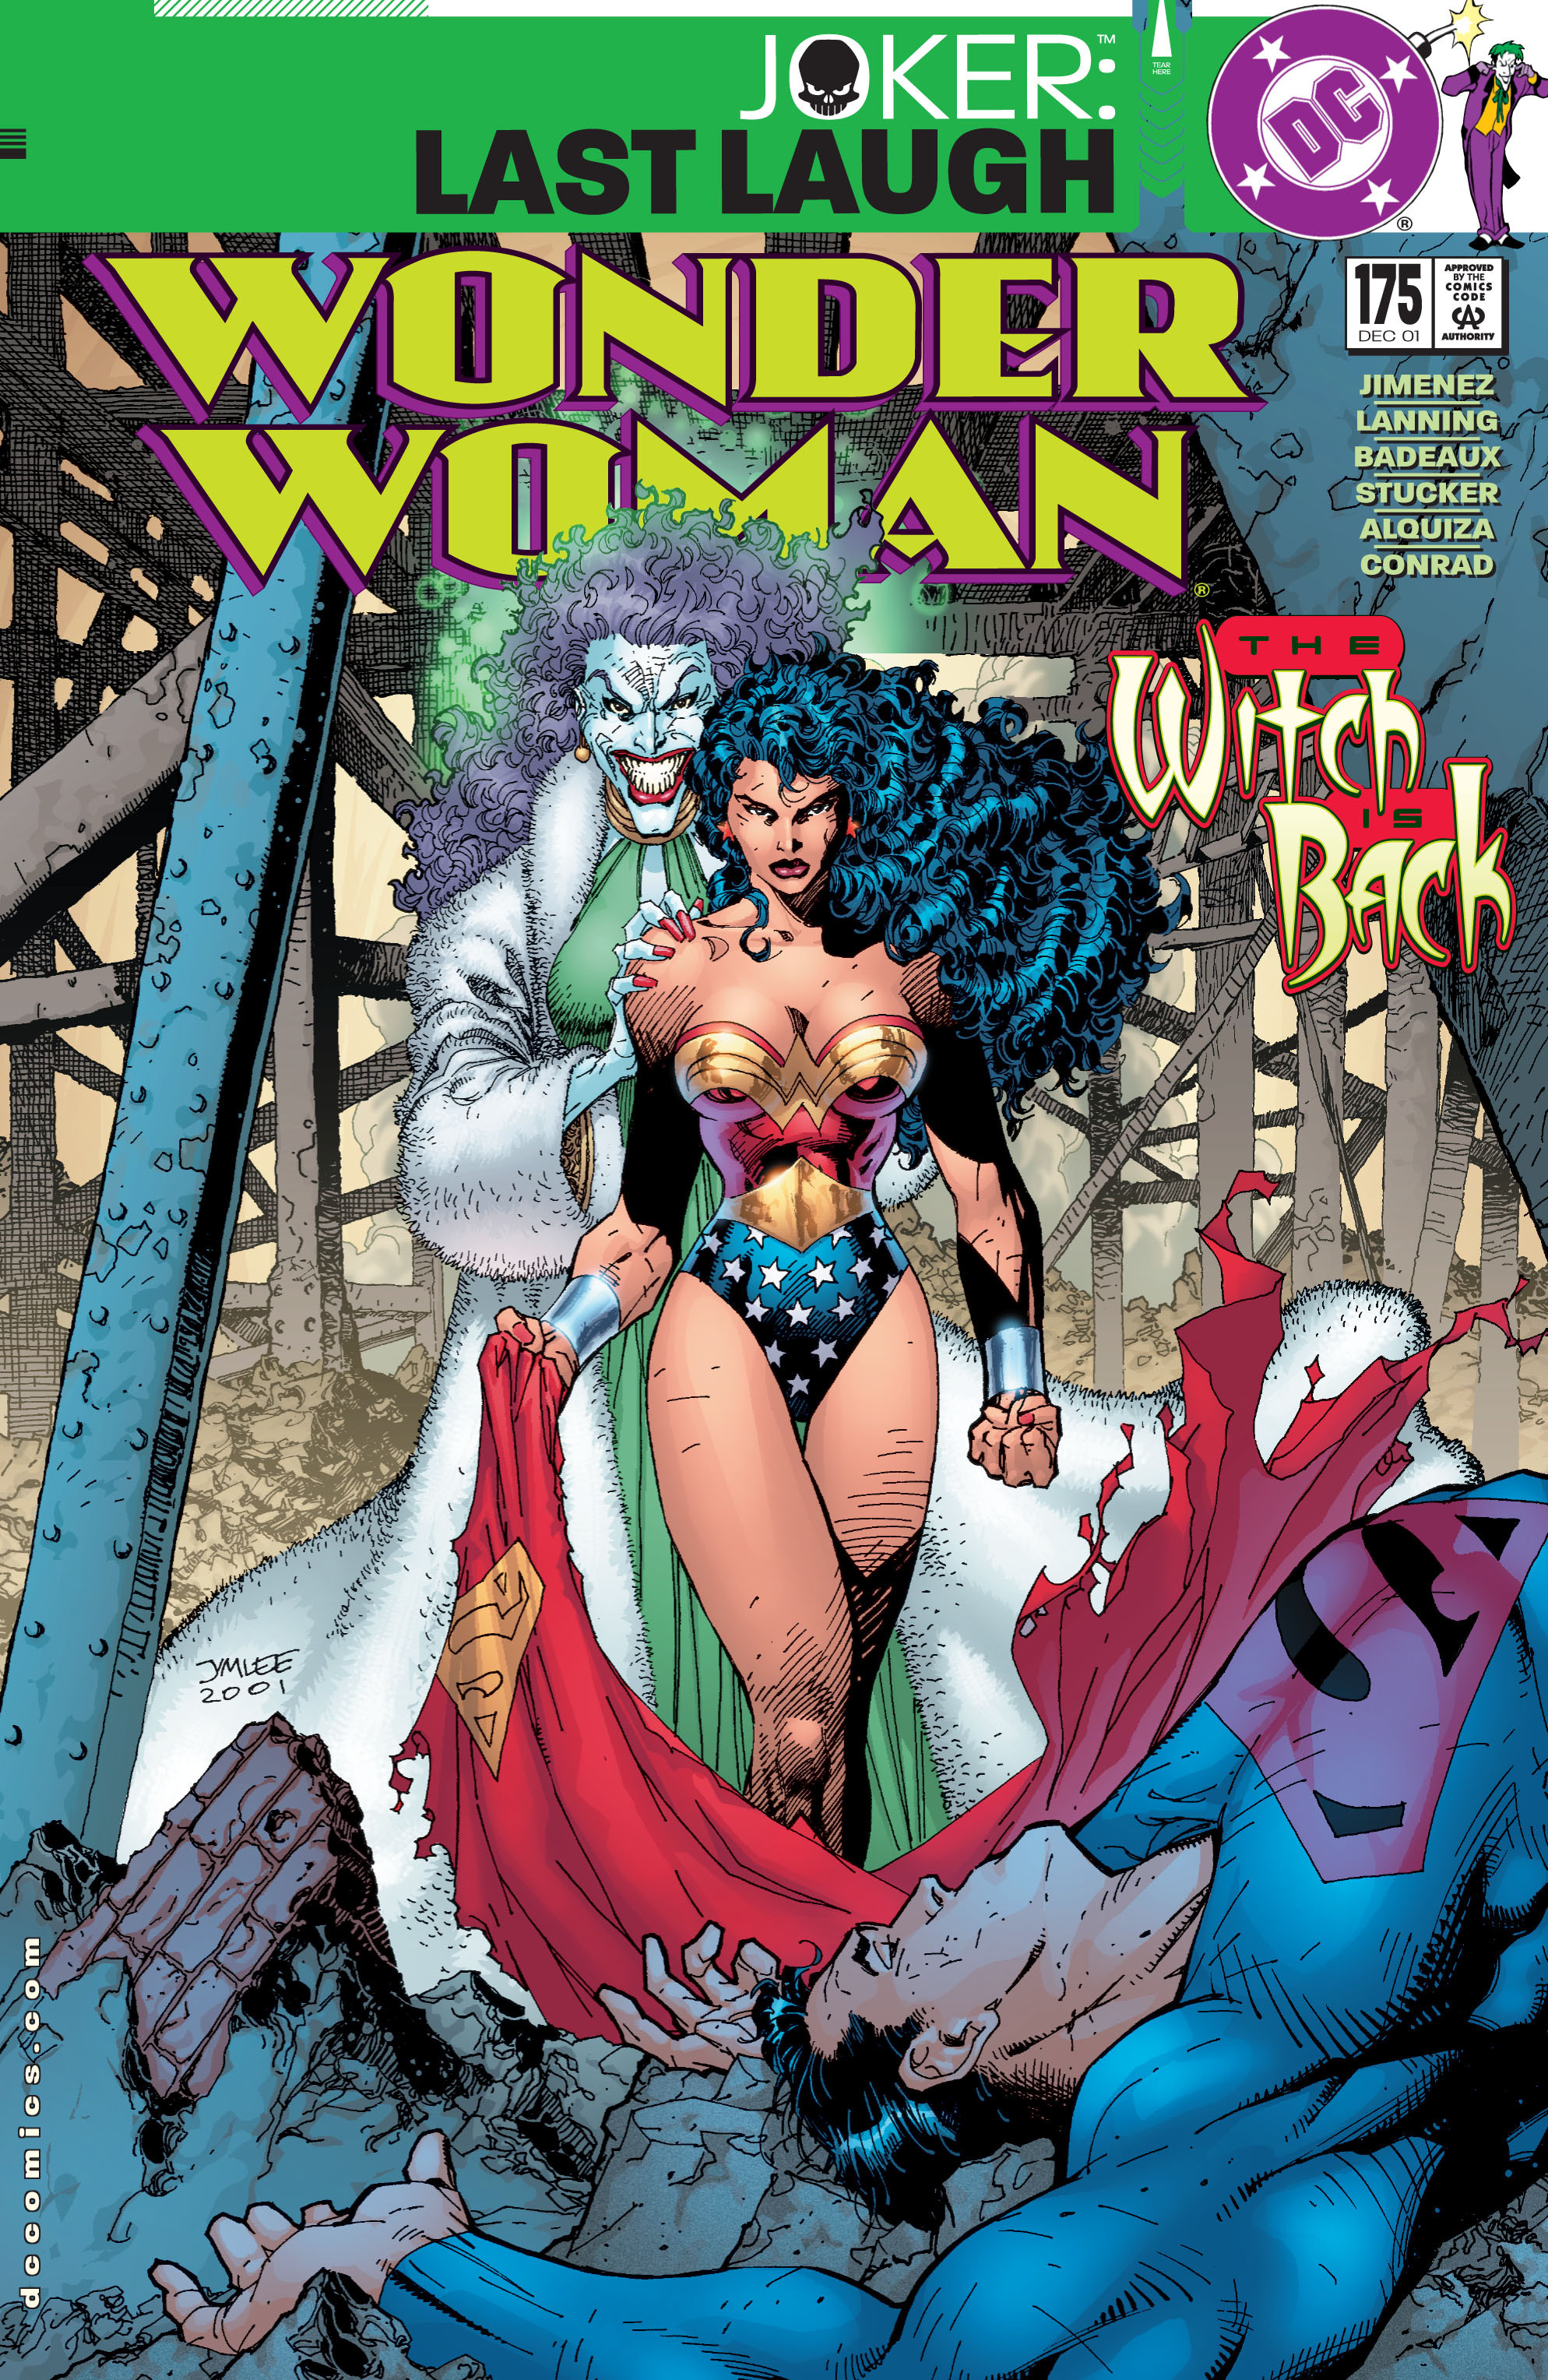 Read online Wonder Woman (1987) comic -  Issue #175 - 1